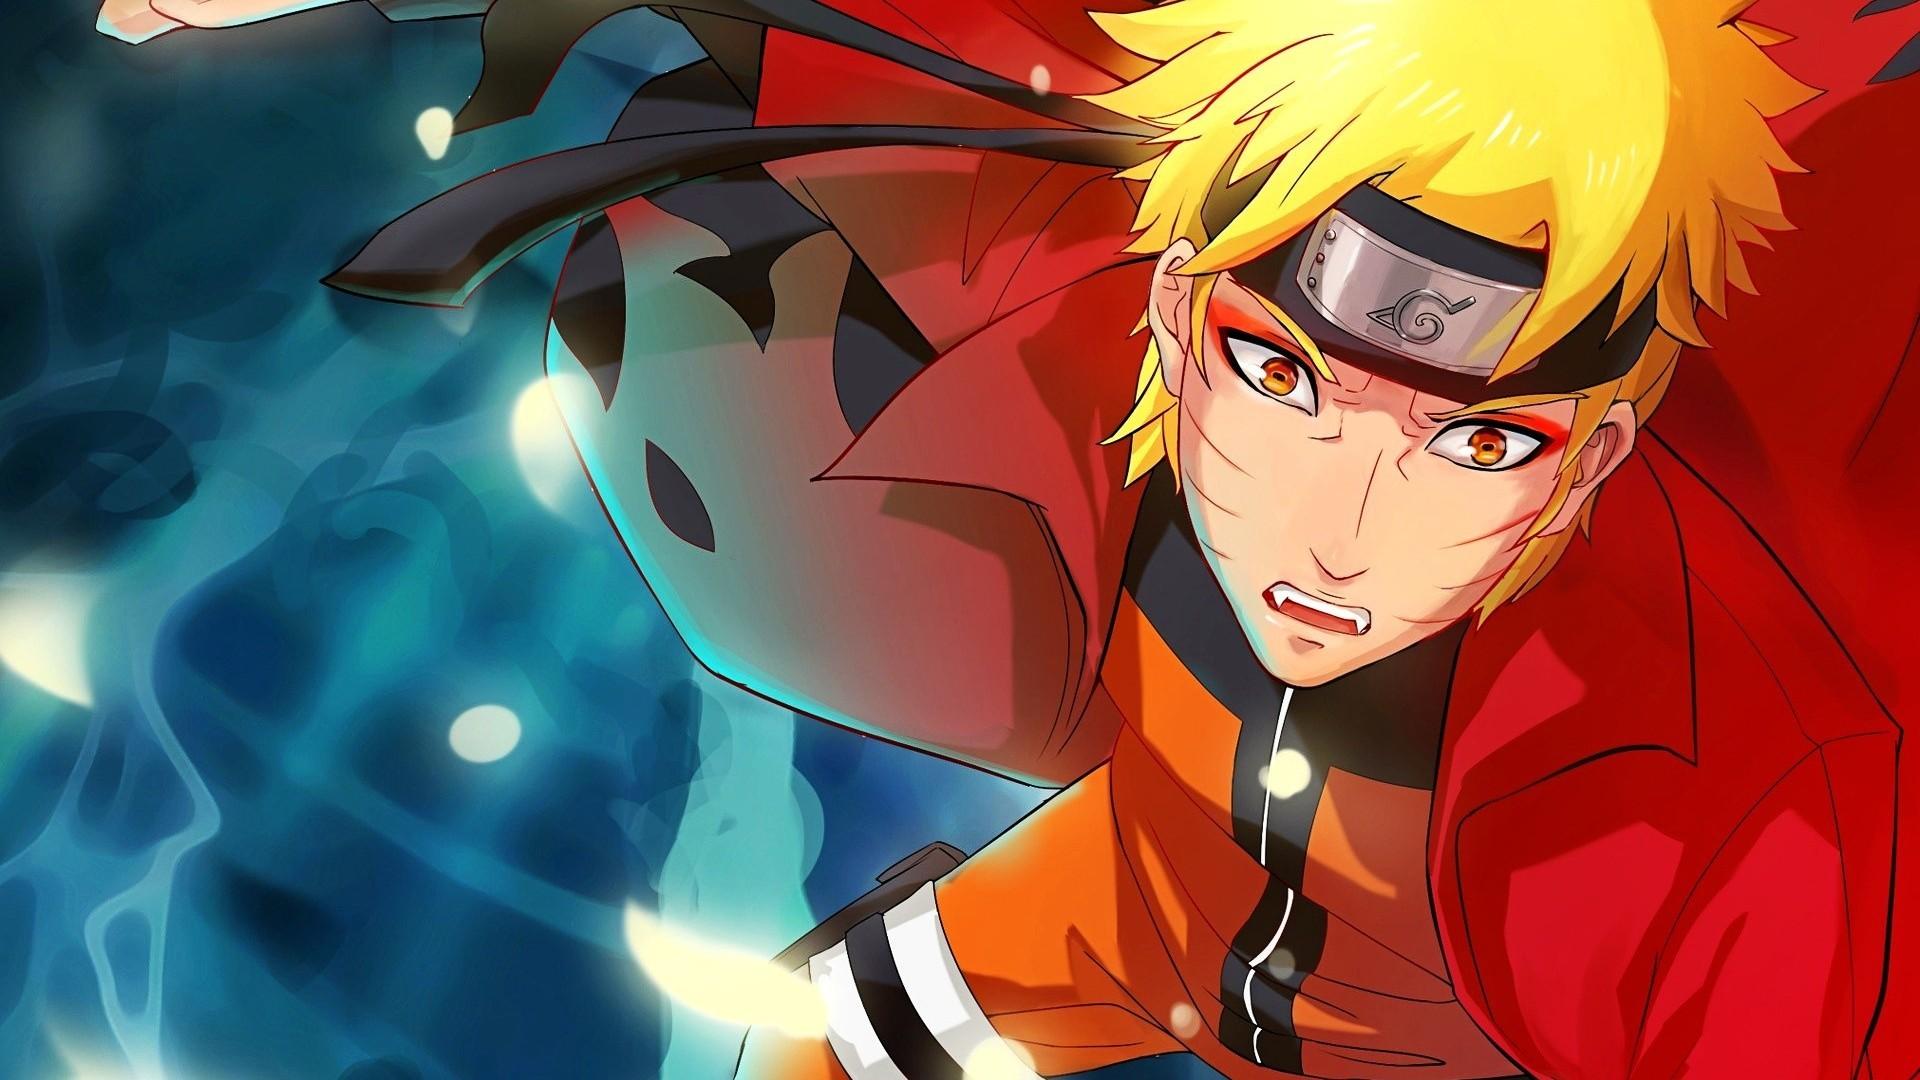 1920x1080 Uzumaki Naruto Shippuden Cartoon Characters - Wallpapers PC Free Download